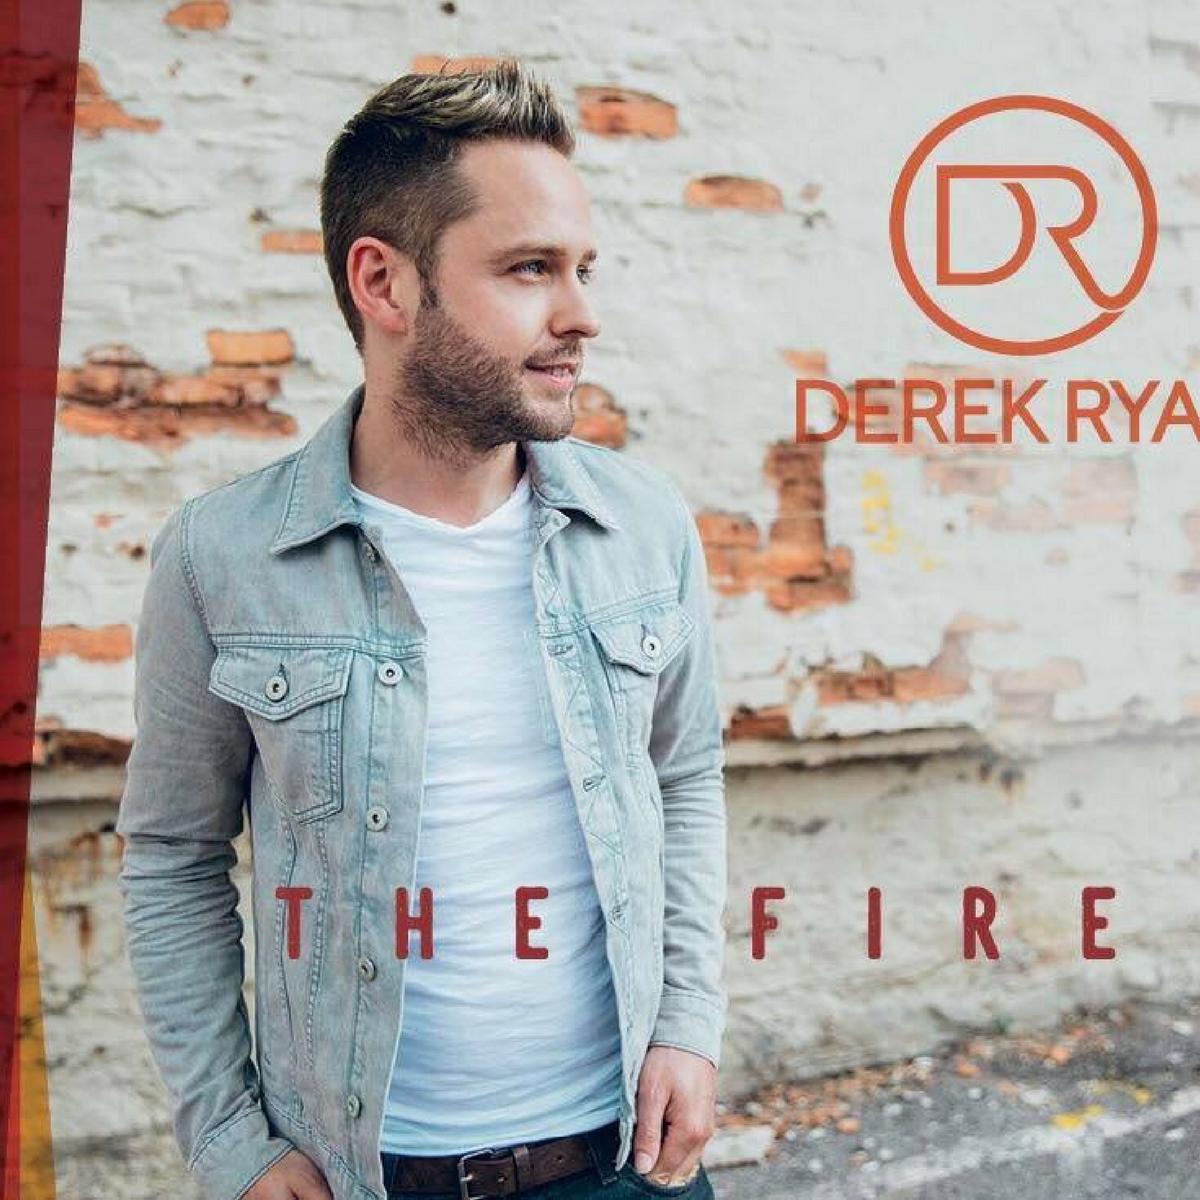 new album archives derek ryan music